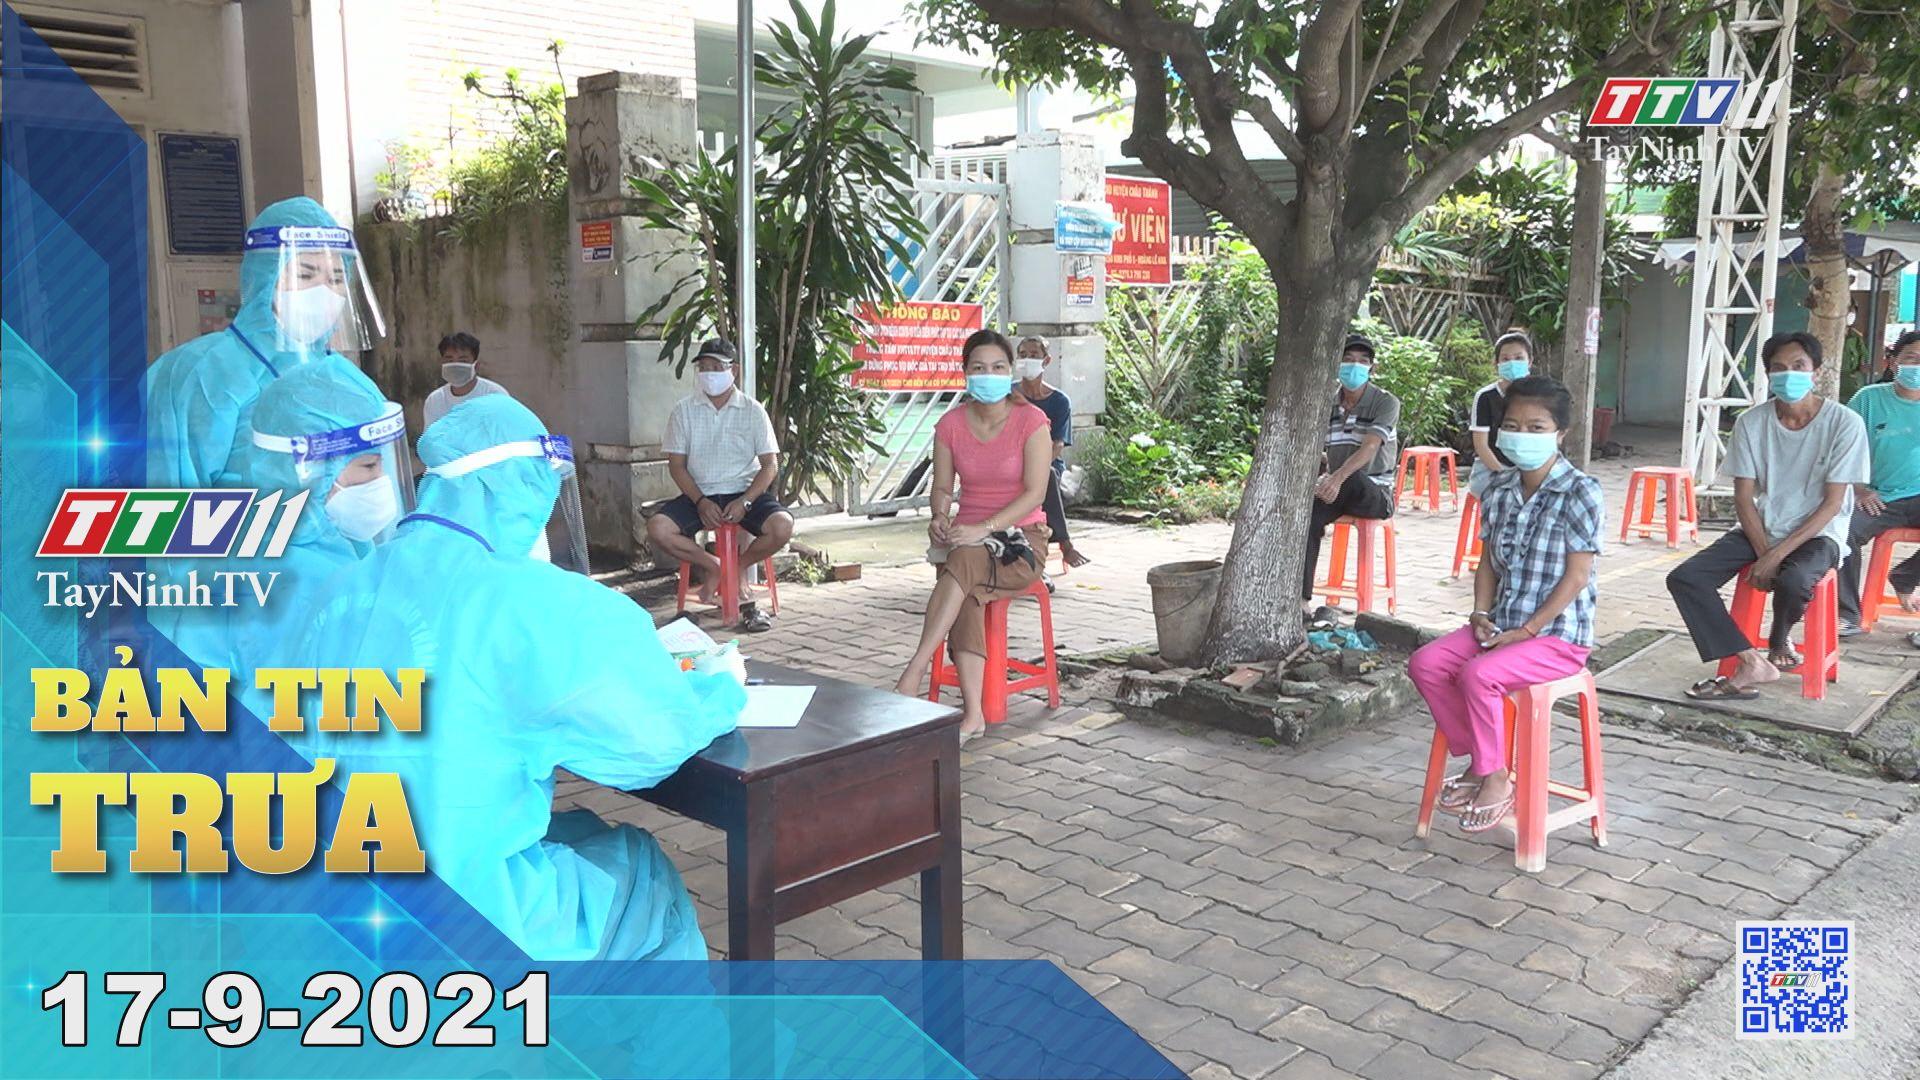 Bản tin trưa 17-9-2021 | Tin tức hôm nay | TayNinhTV